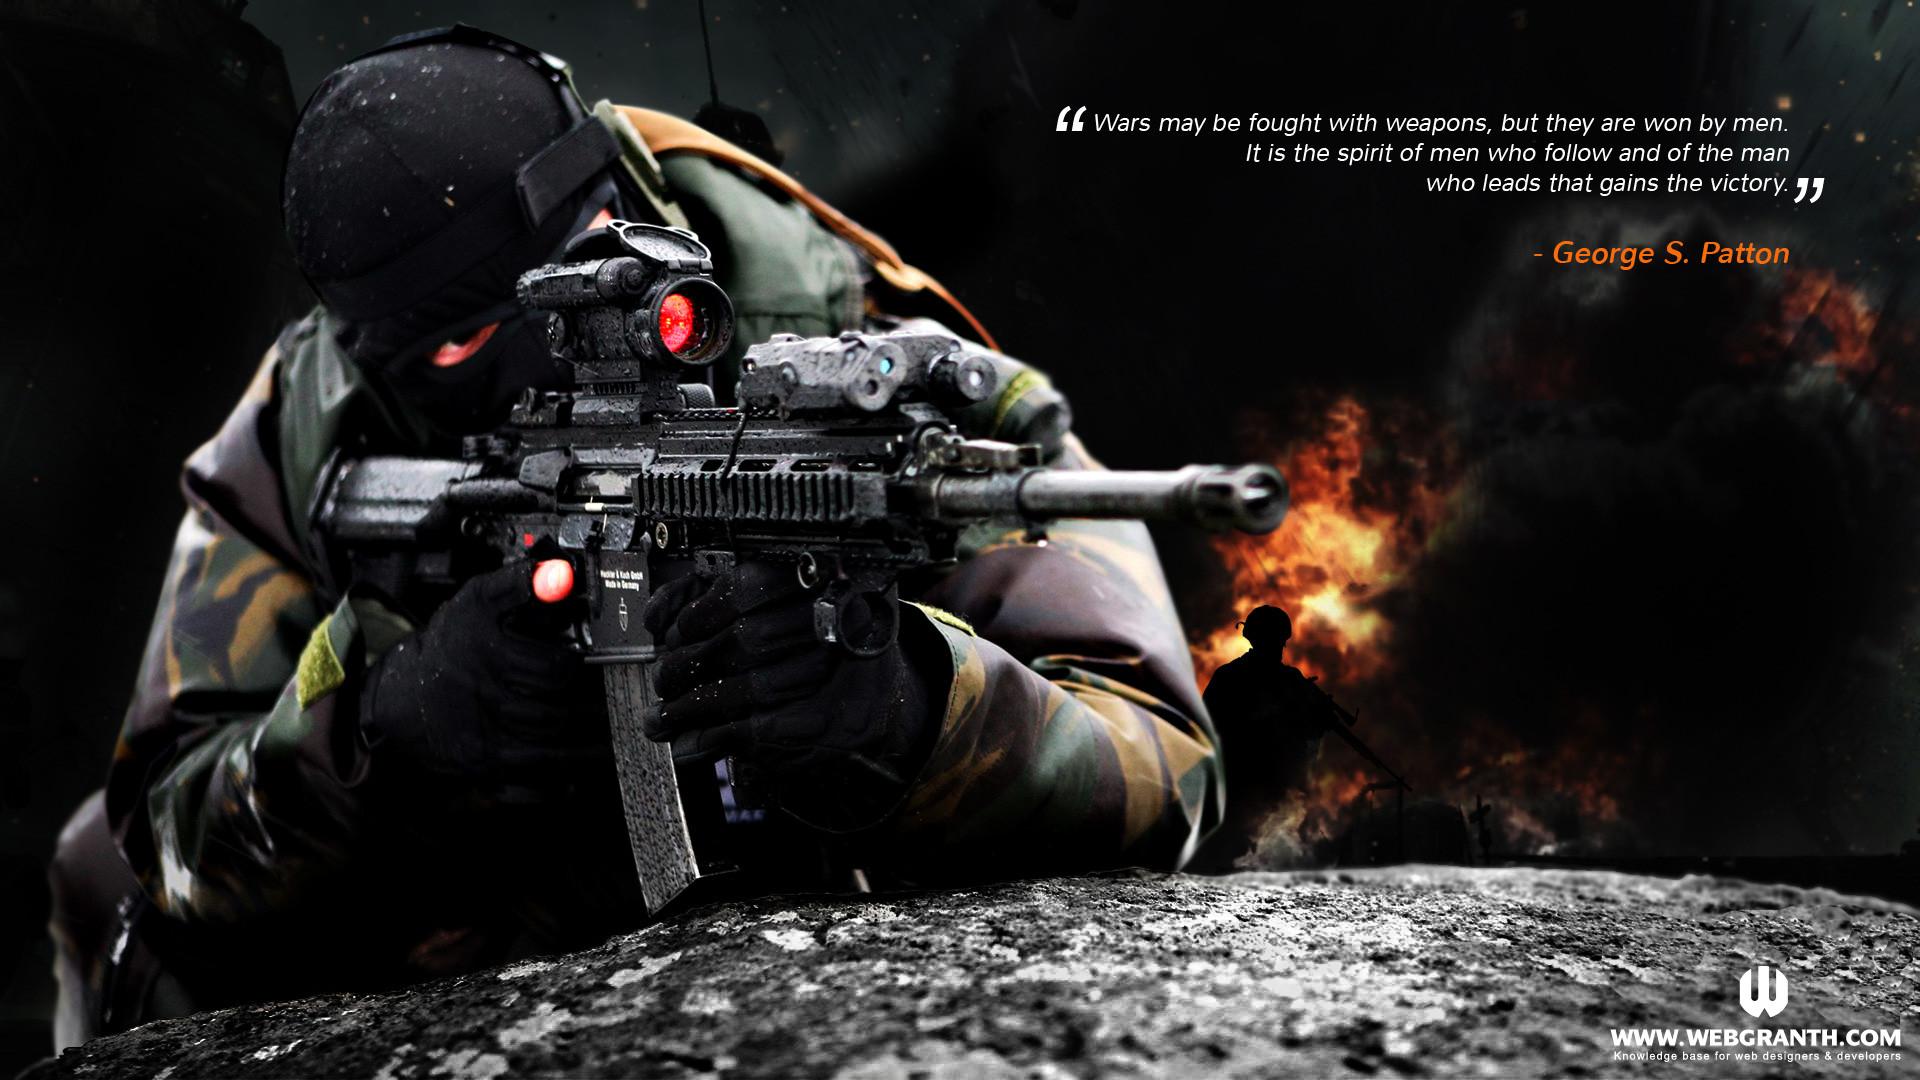 HD Guns Wallpaper: Download HD Guns & Weapons Wallpapers – Webgranth .